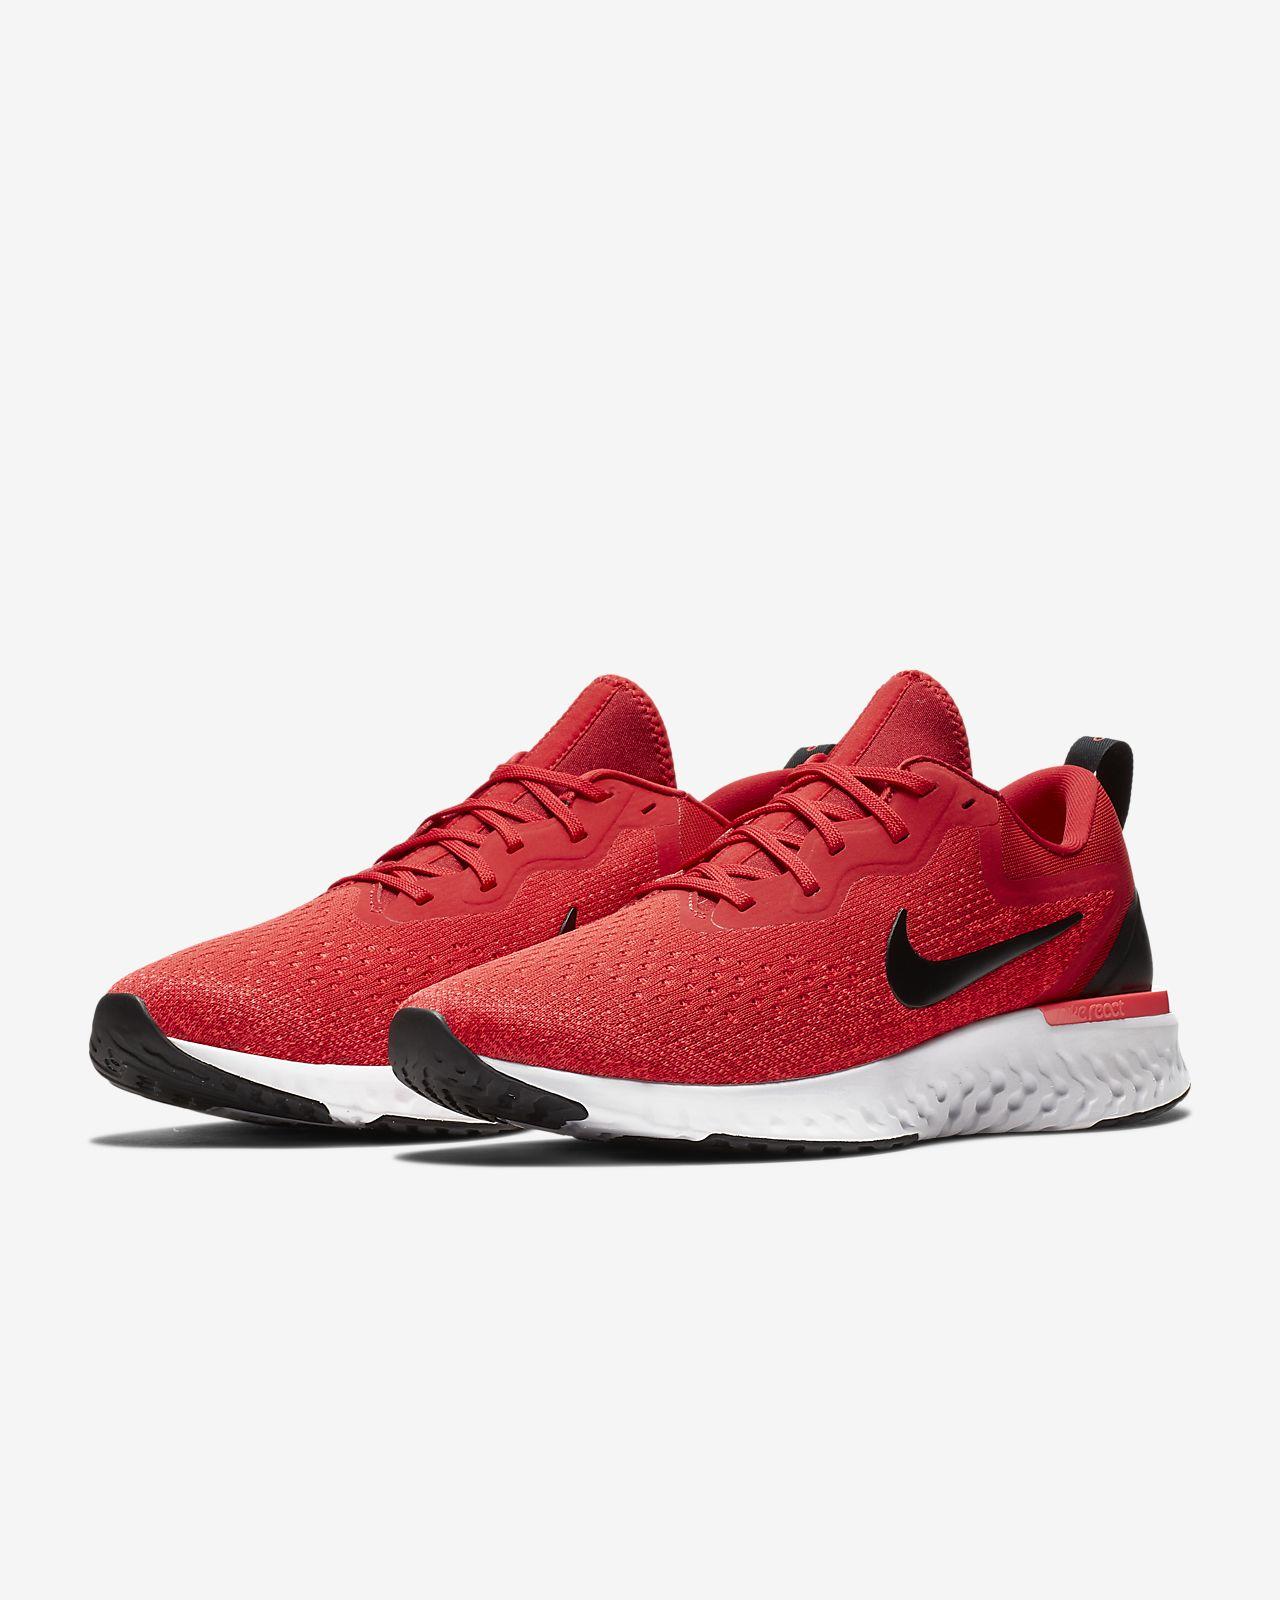 lowest price 32ac2 e8e76 ... Nike Odyssey React Mens Running Shoe